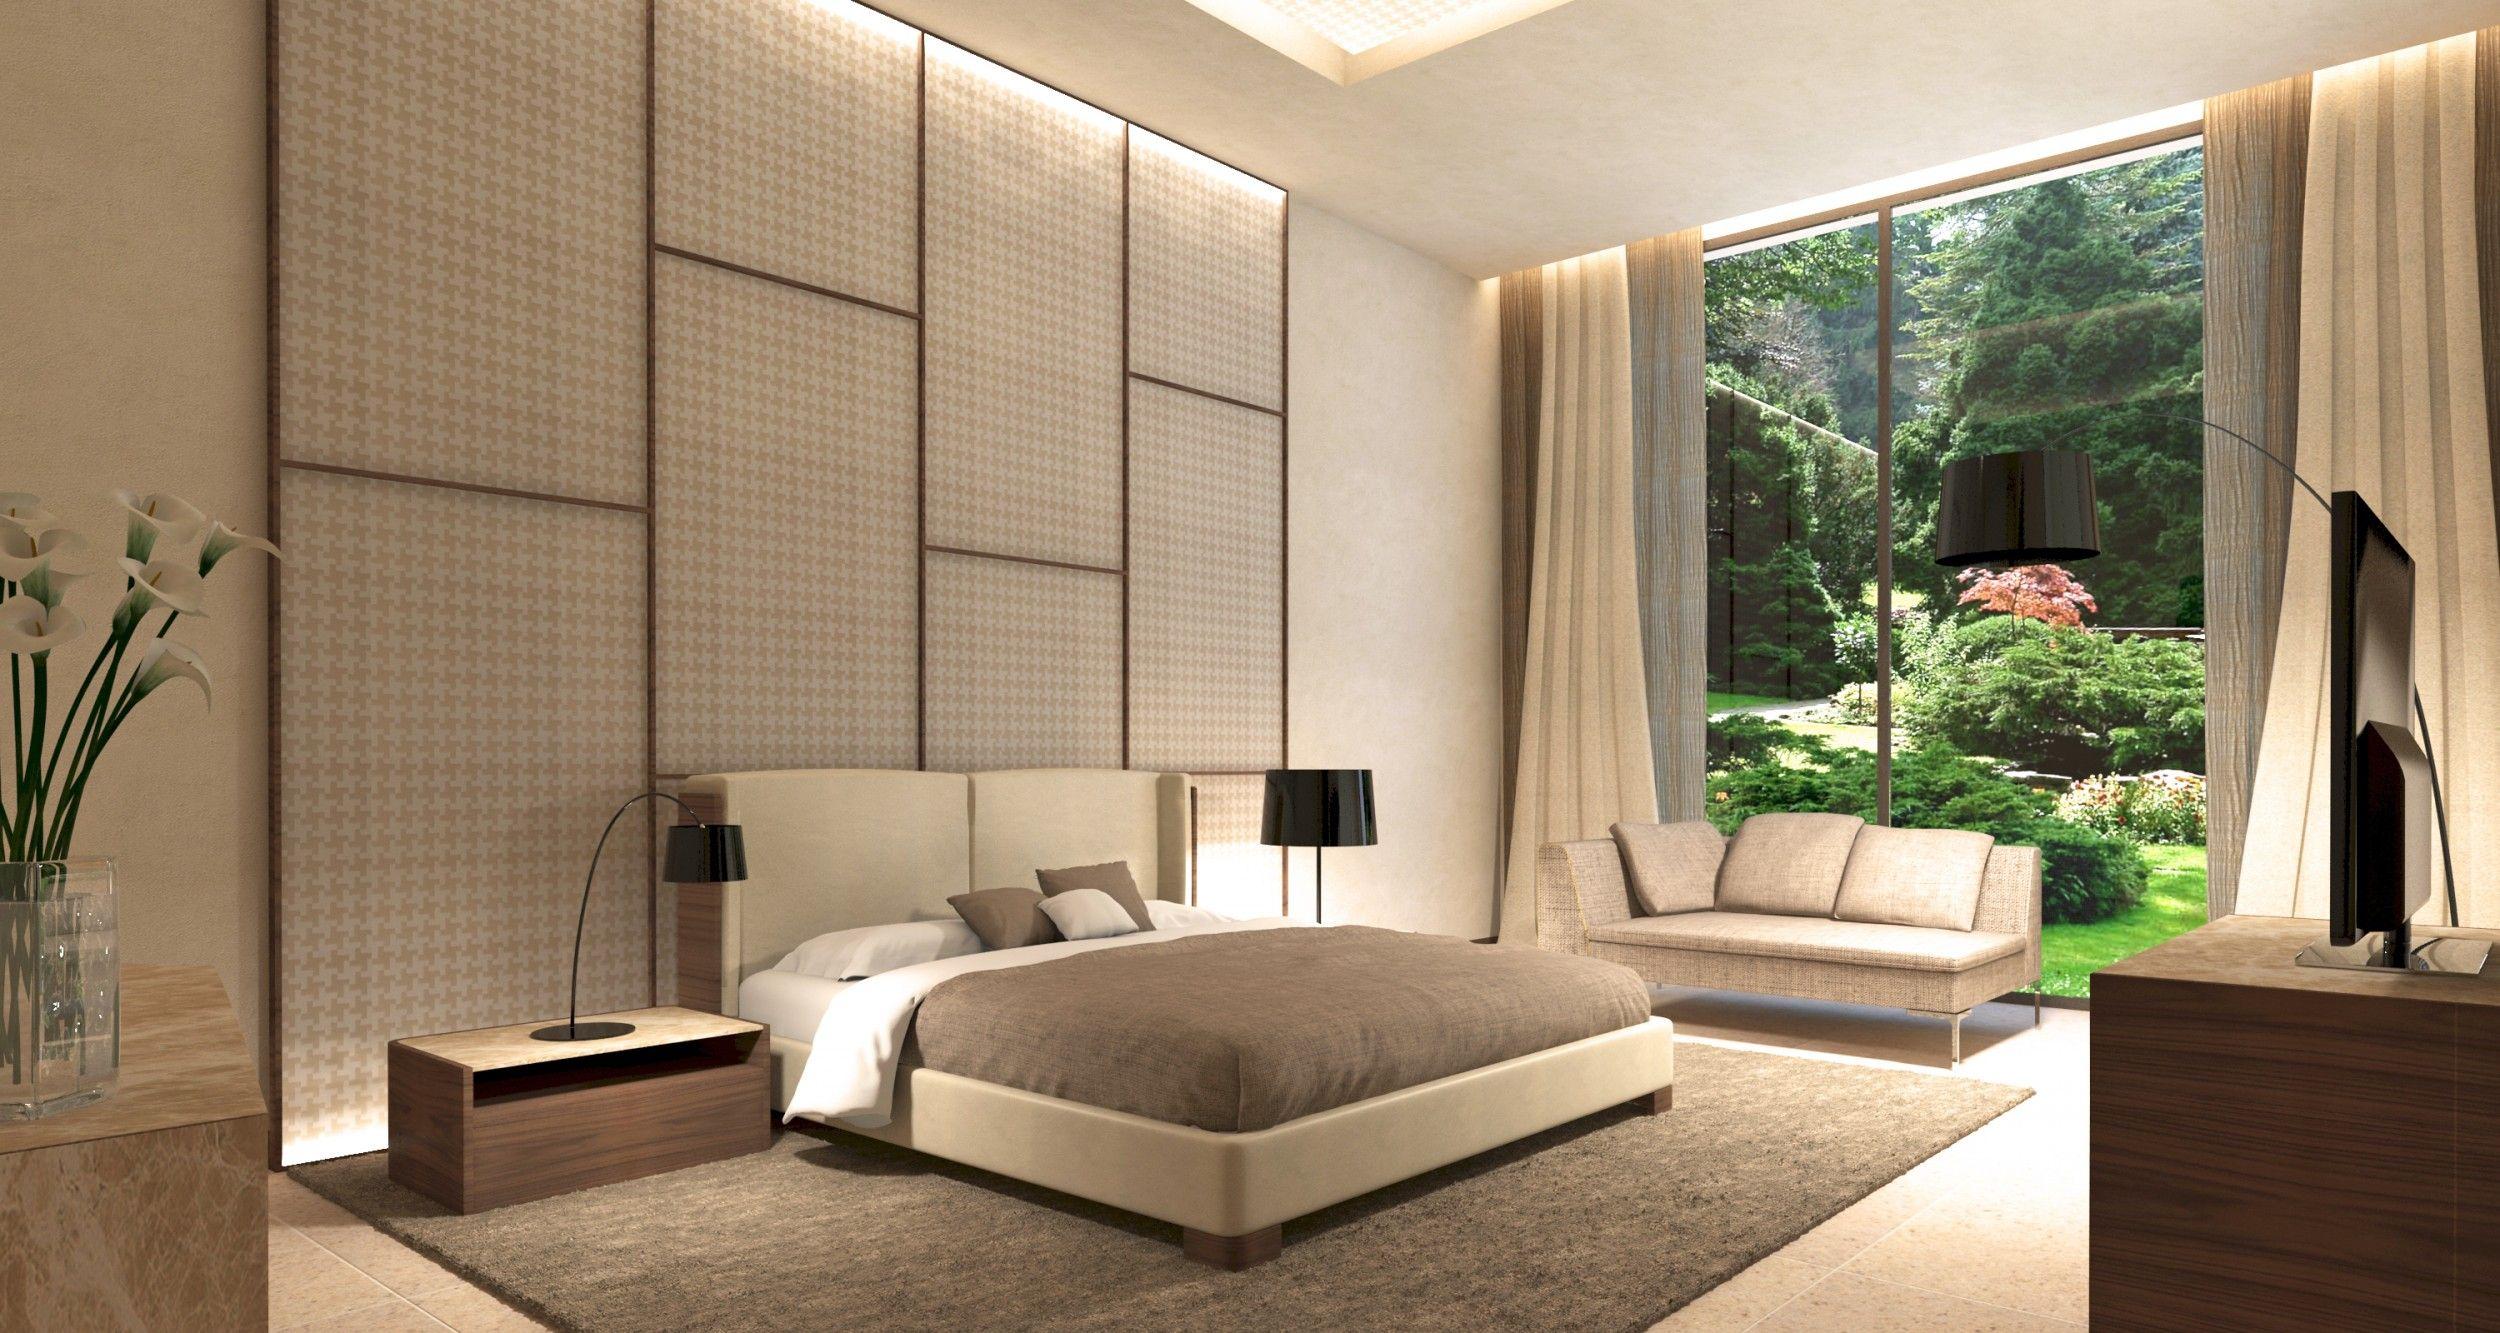 Pin By Ju Julie On Bedroom International Interior Design Interior Design Interior Designers